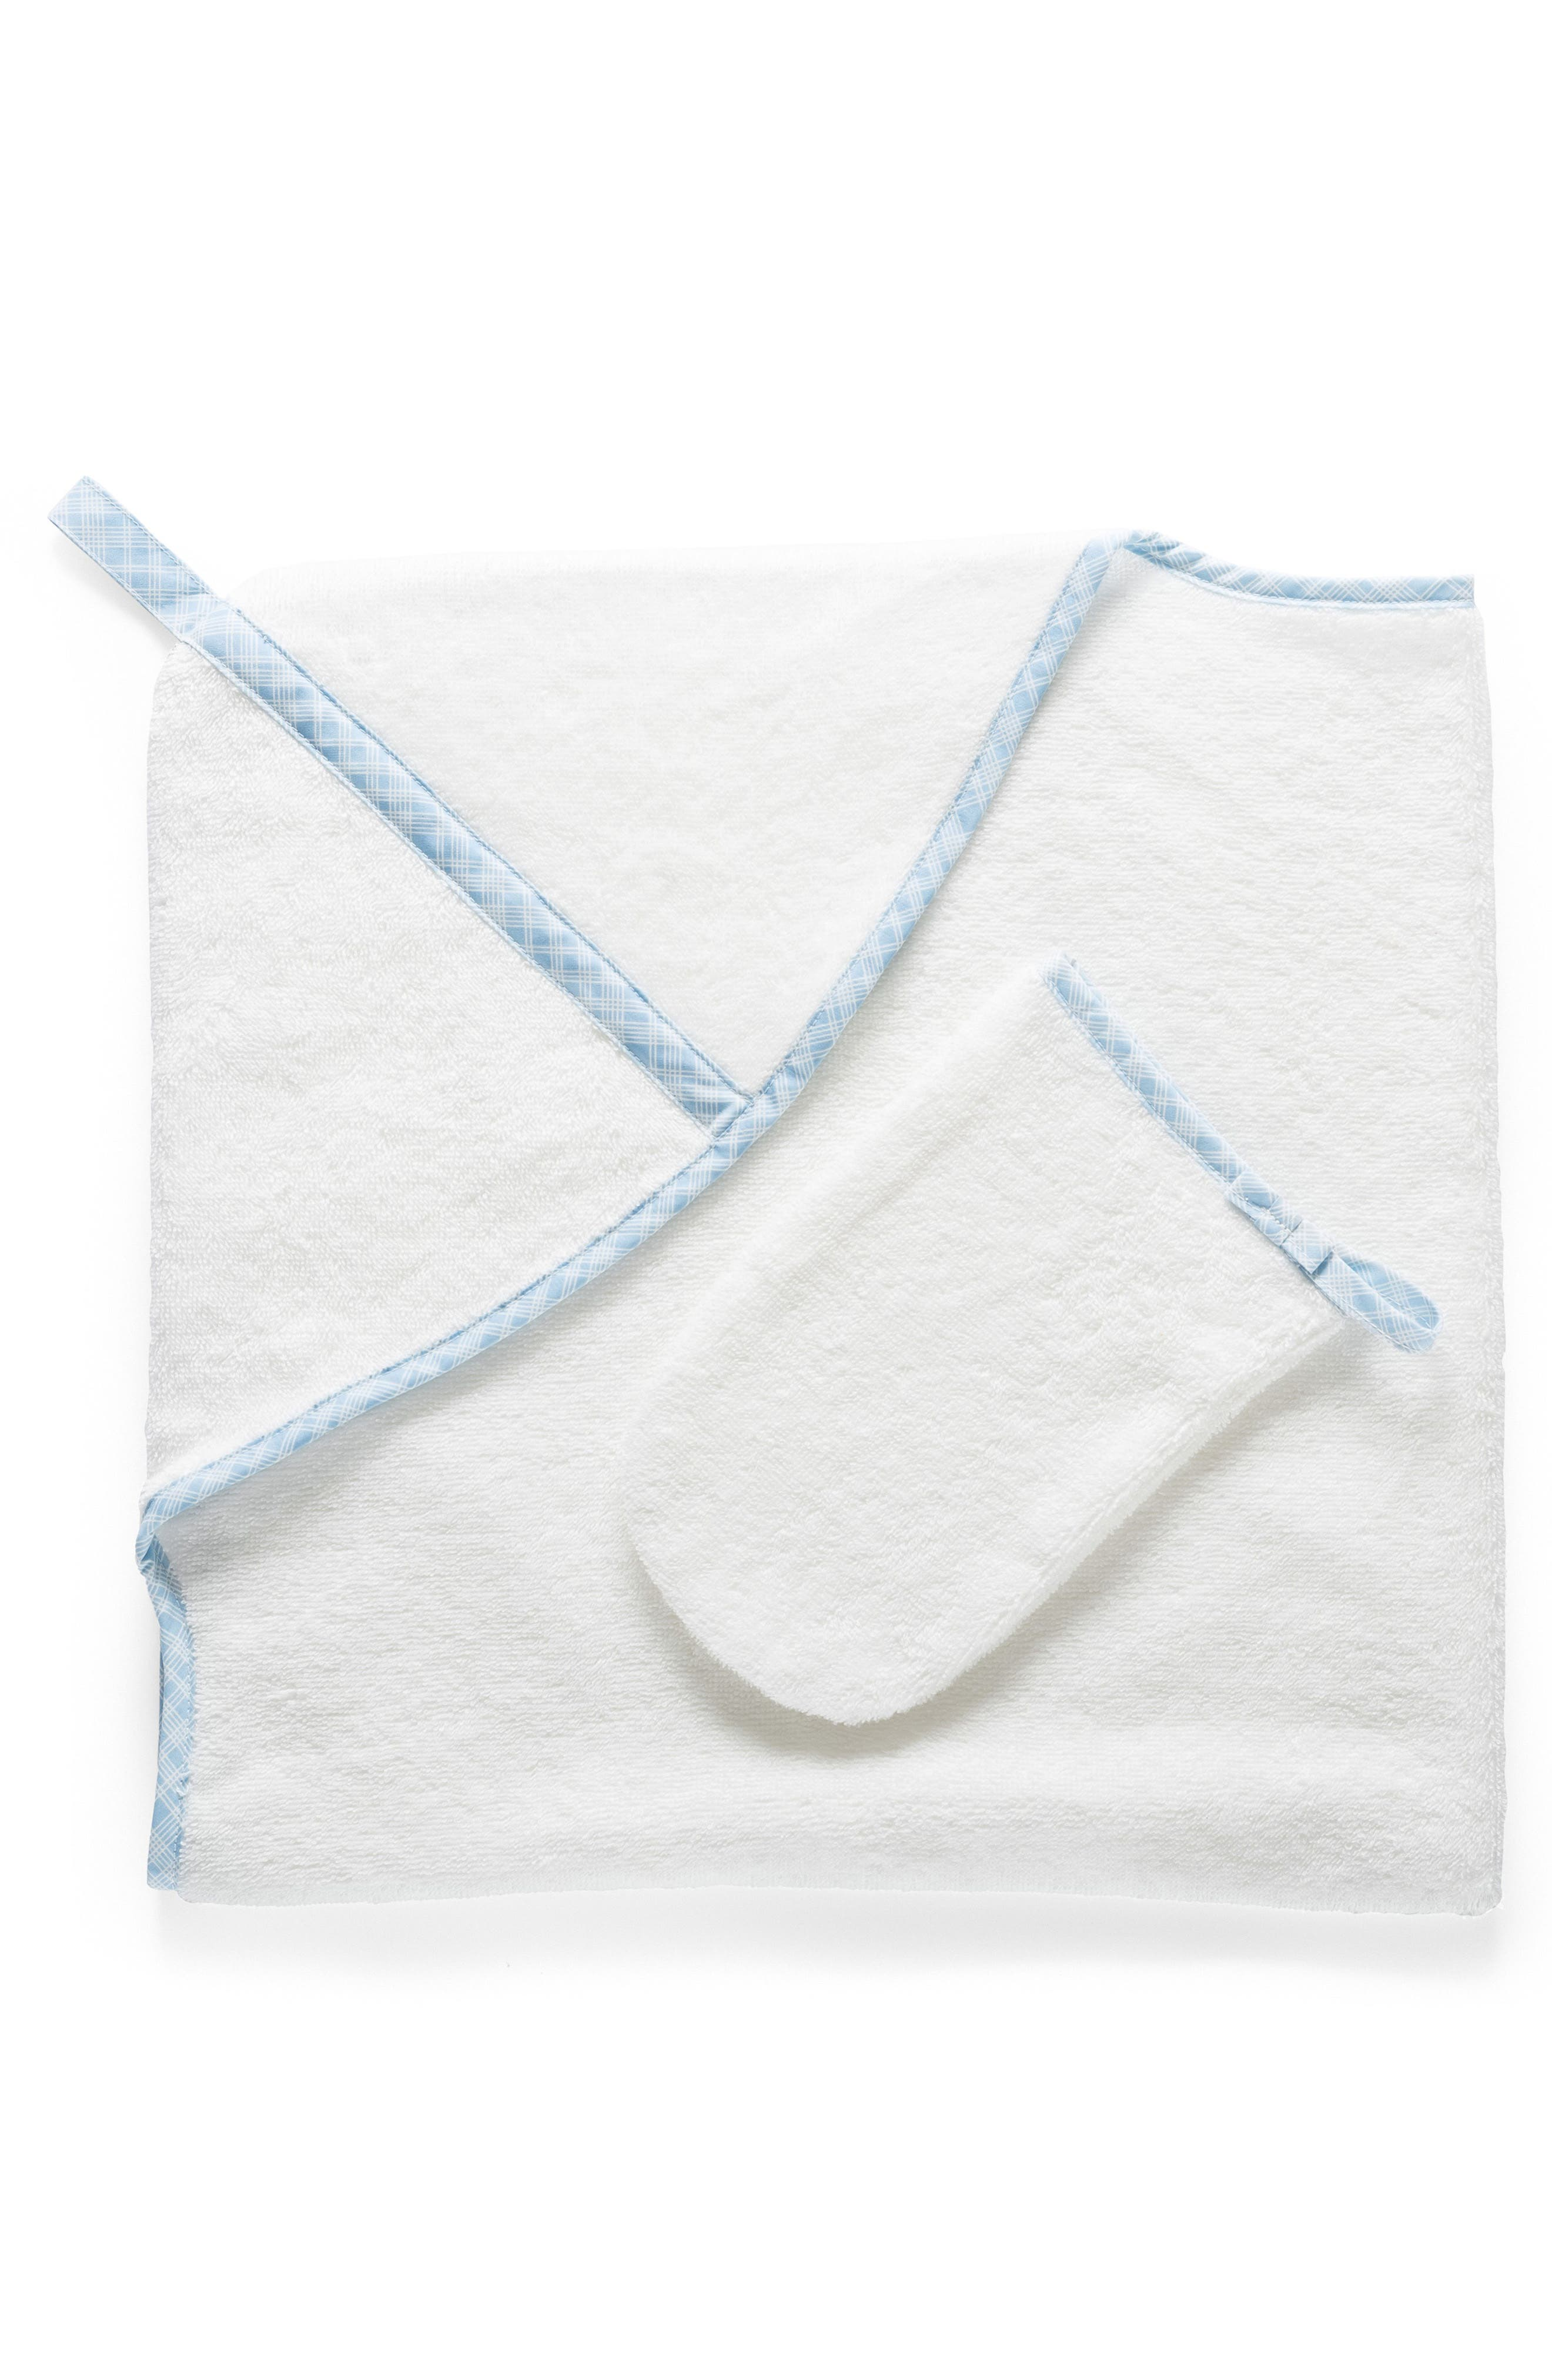 Hooded Towel & Bath Mitt Set,                             Main thumbnail 1, color,                             499